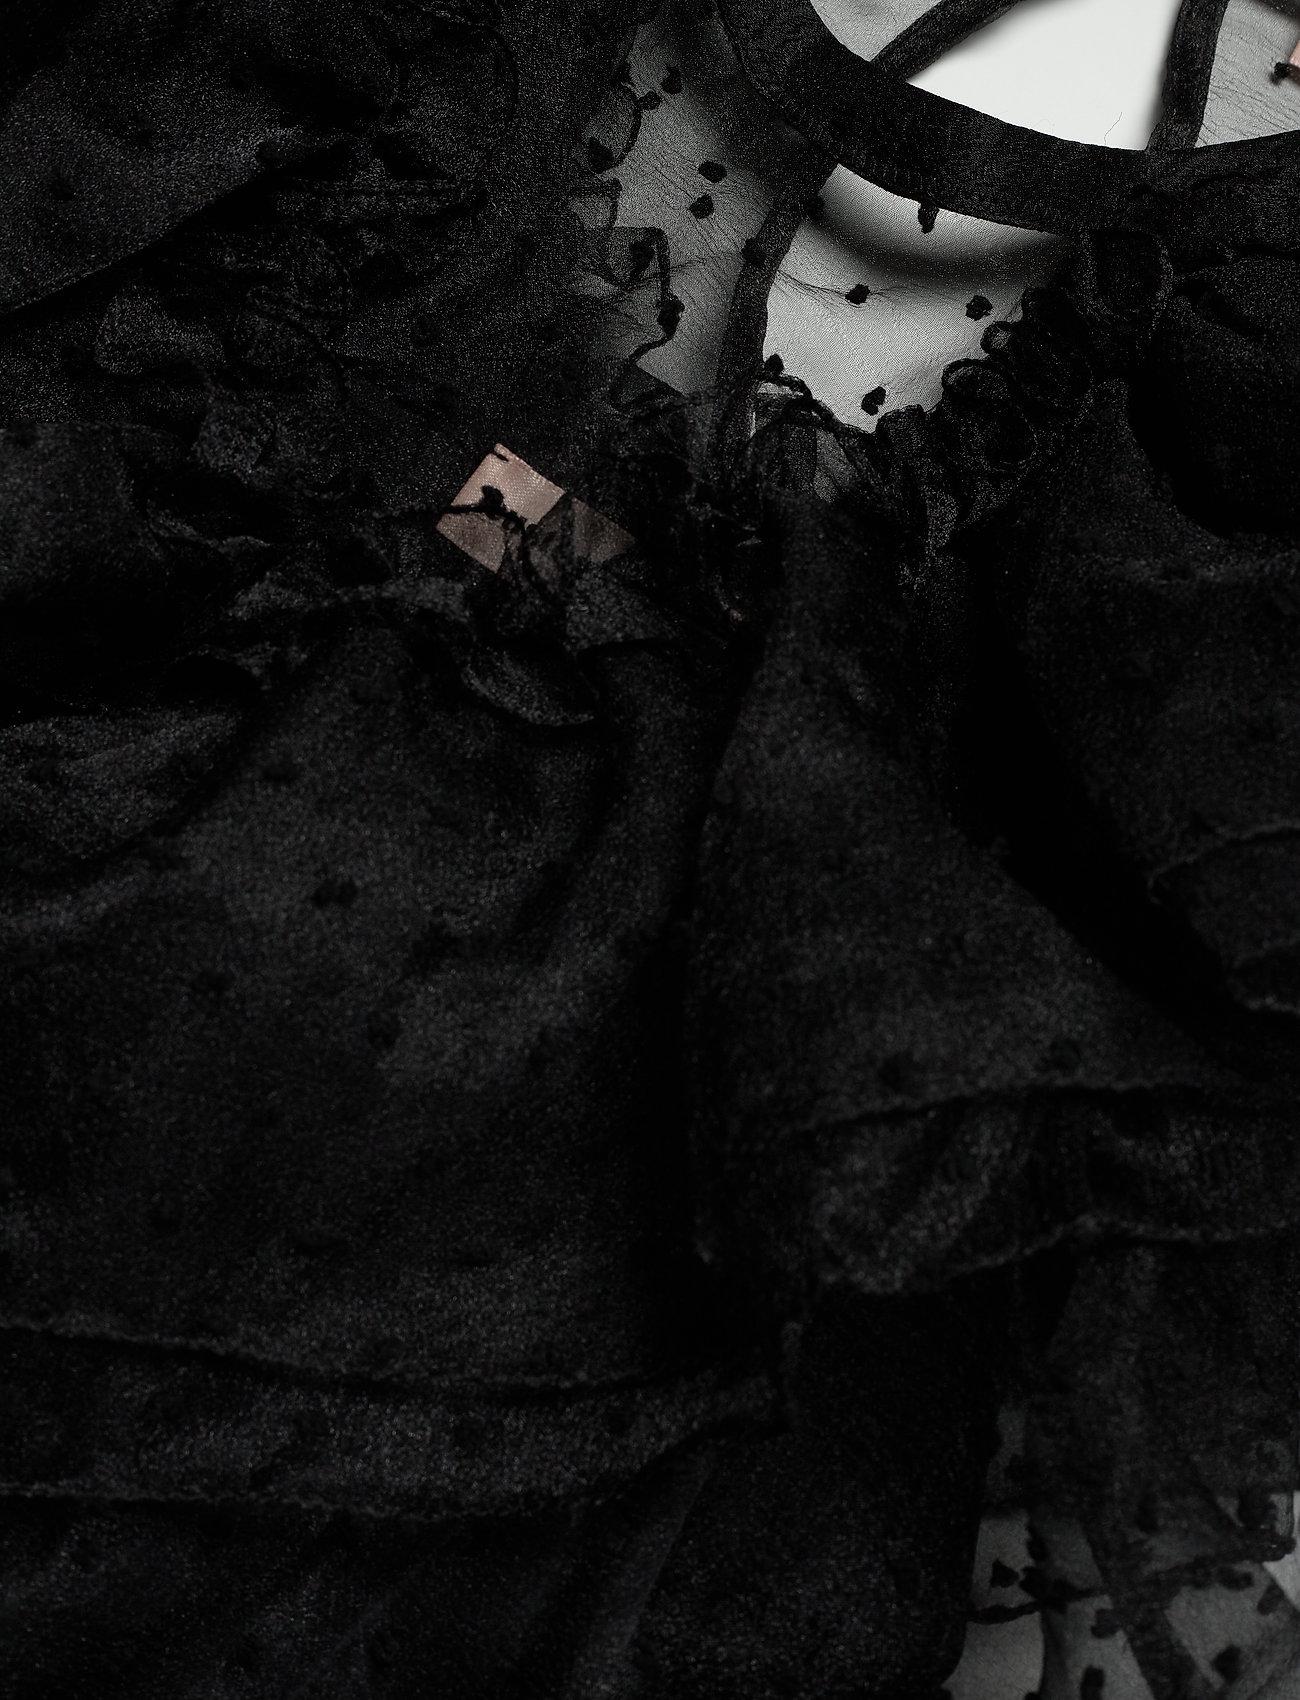 Violet (Anthracite Black) (113.75 €) - Custommade hrPcP